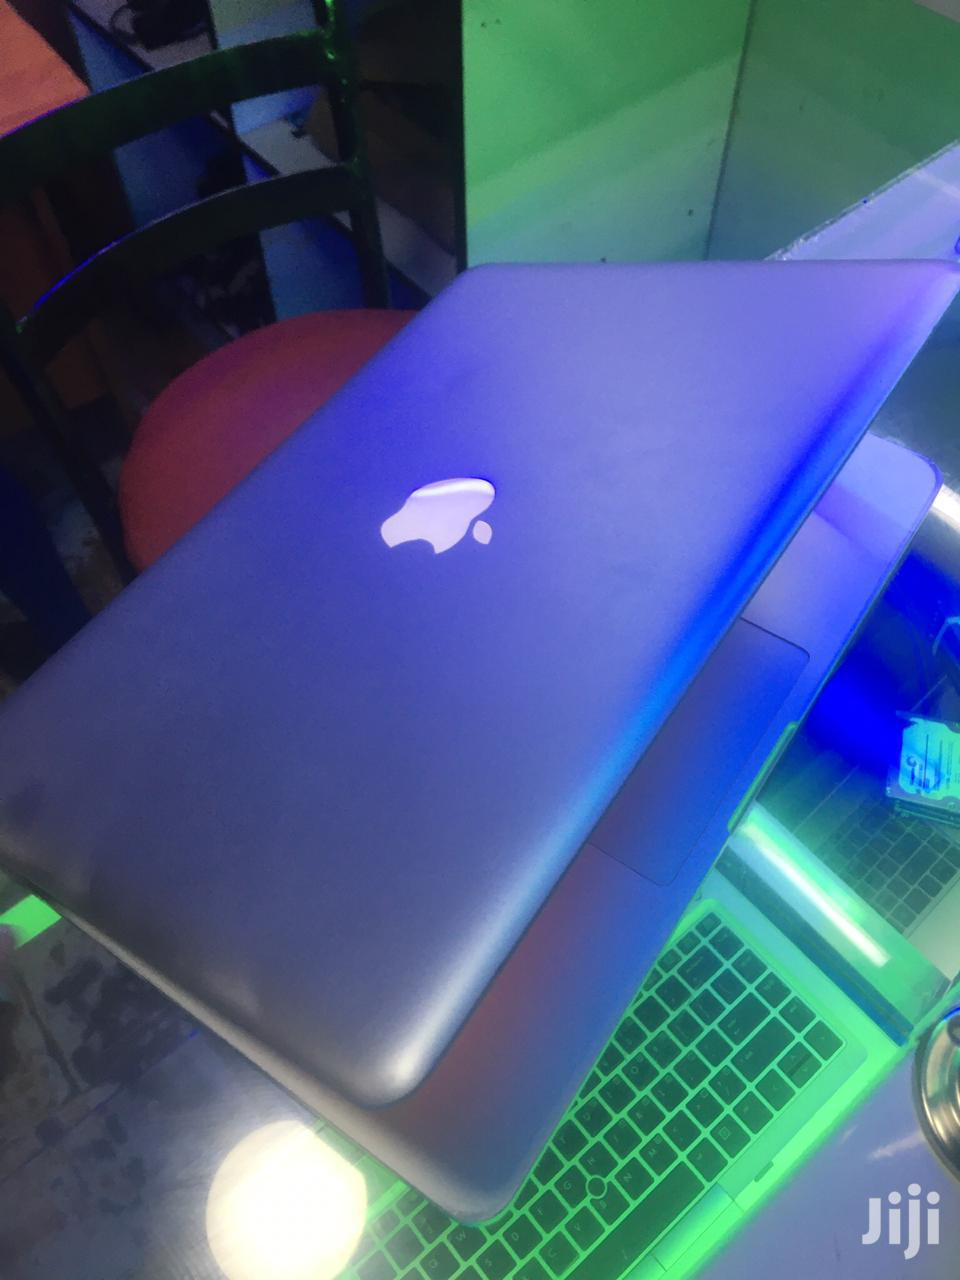 Laptop Apple MacBook 4GB Intel Core 2 Duo HDD 500GB | Laptops & Computers for sale in Nairobi Central, Nairobi, Kenya